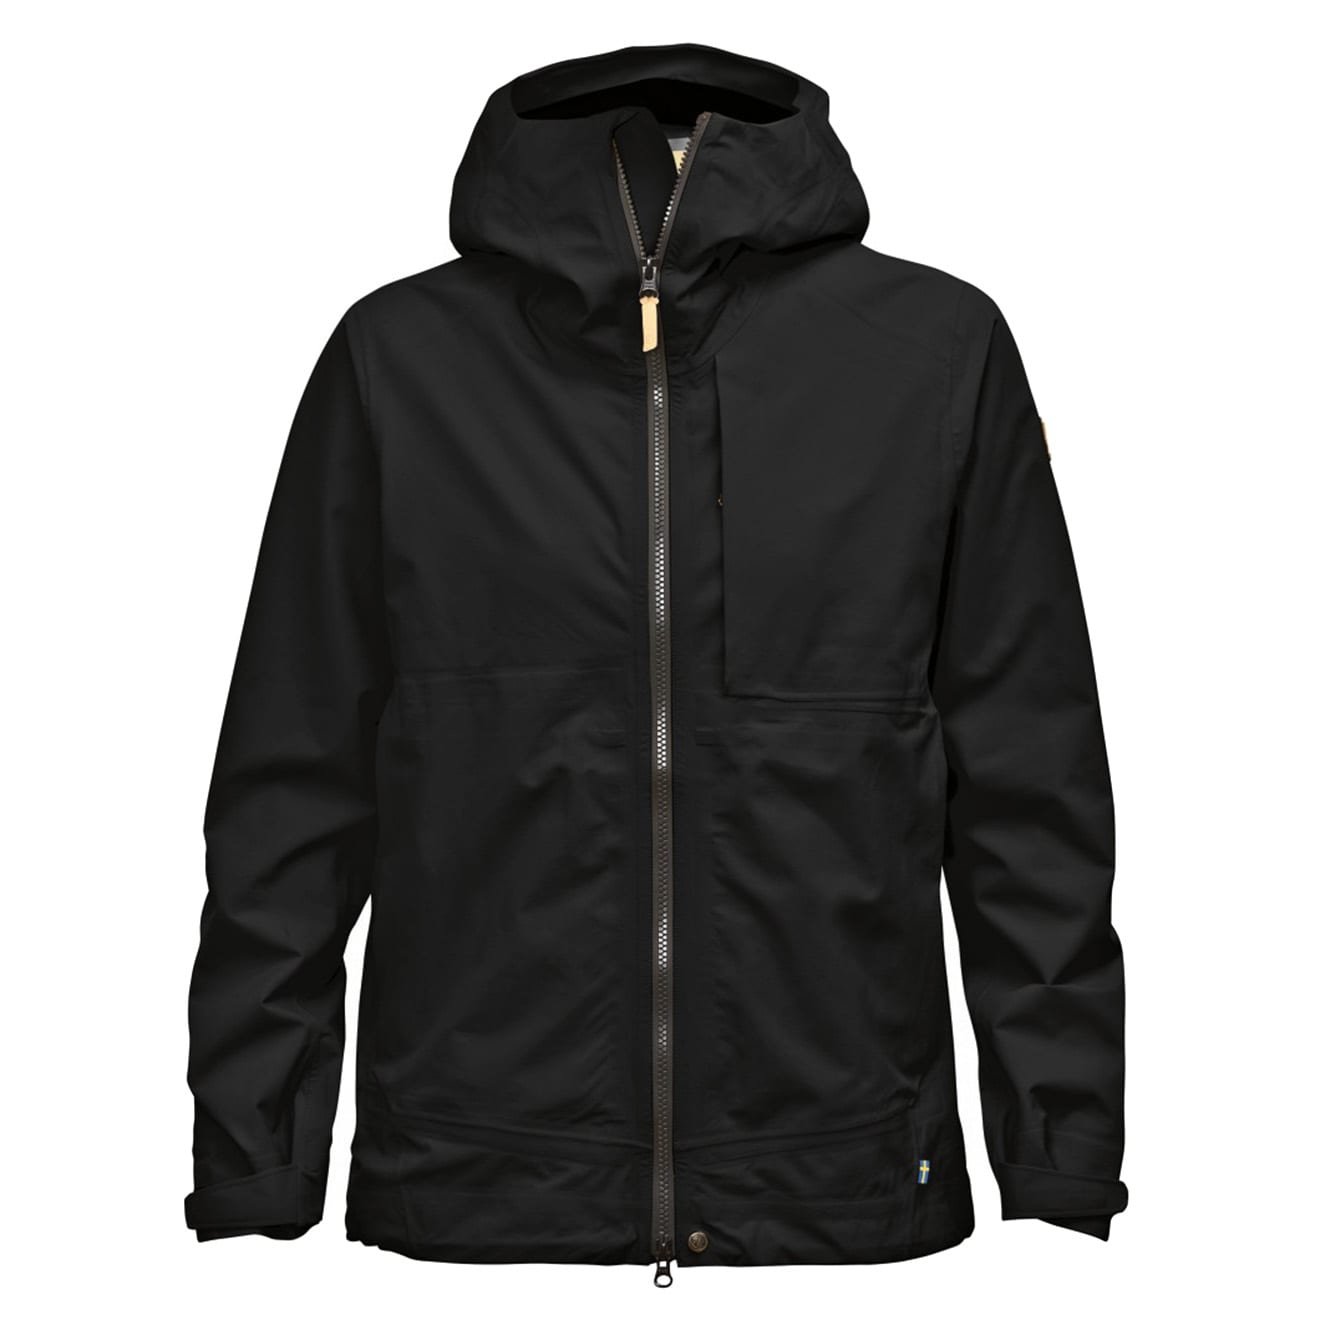 Fjallraven Womens Abisko Eco-Shell Jacket Black